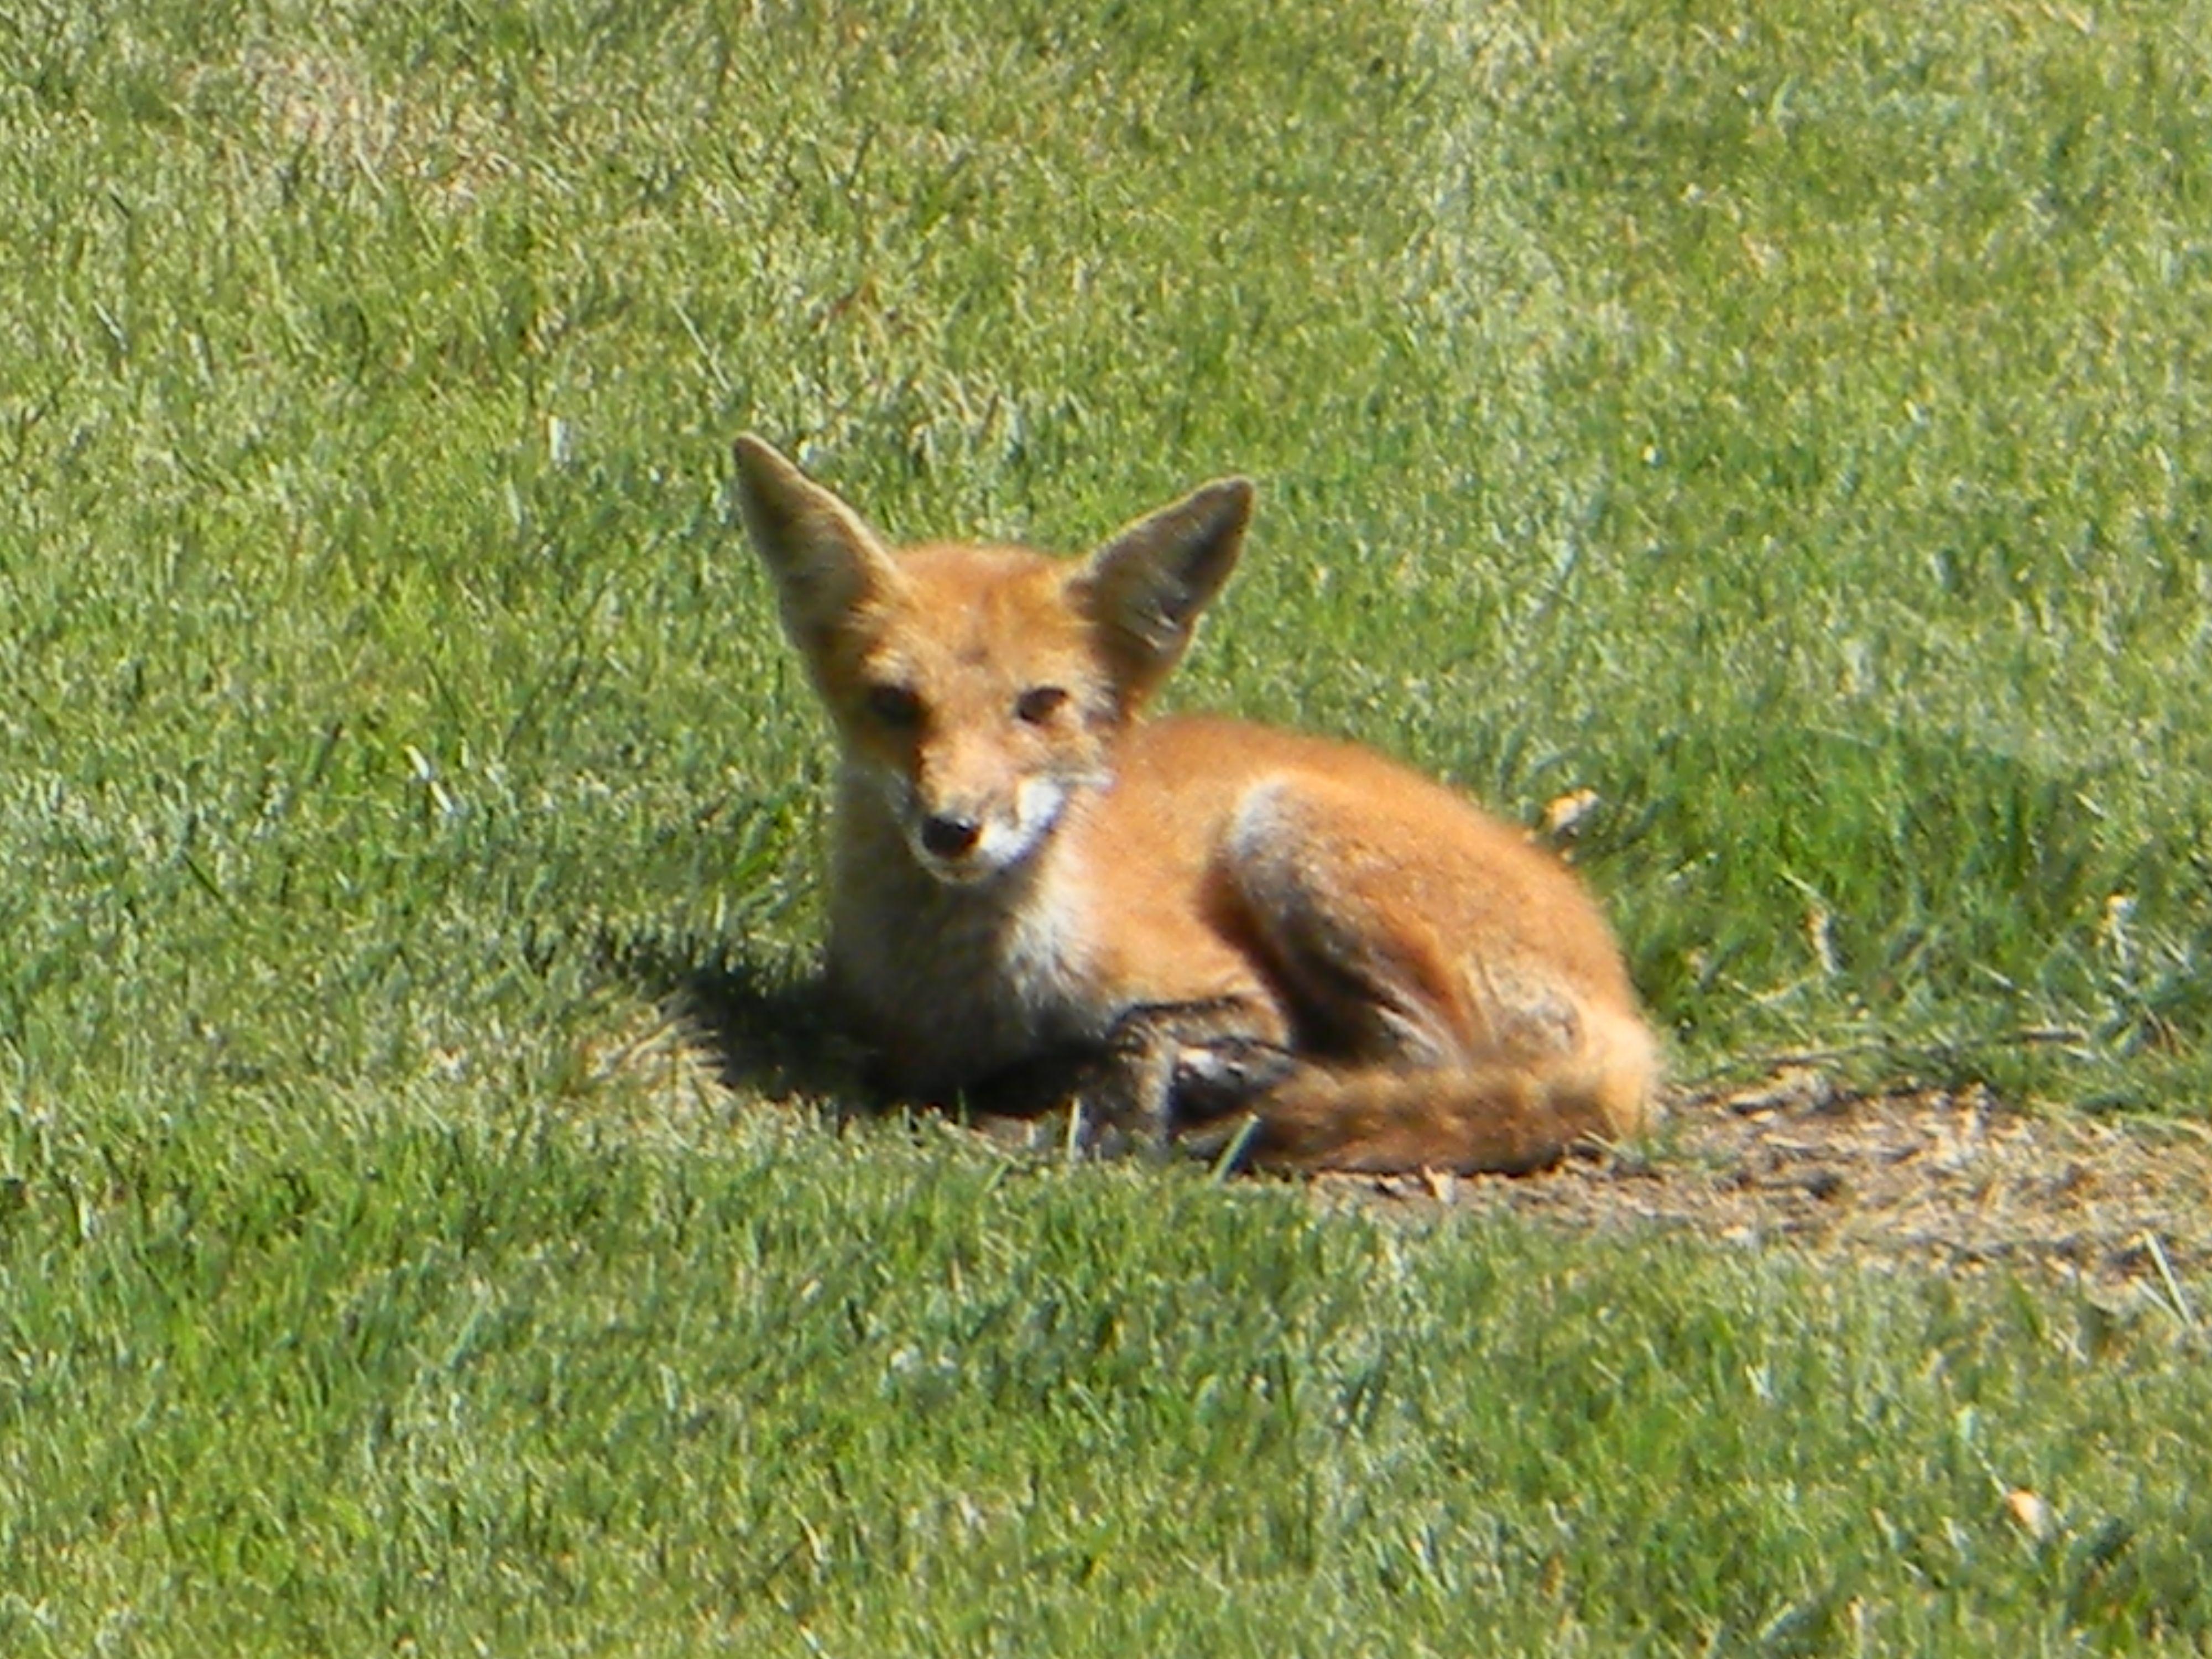 Fox in our yard | Pet birds, Animals, Fox